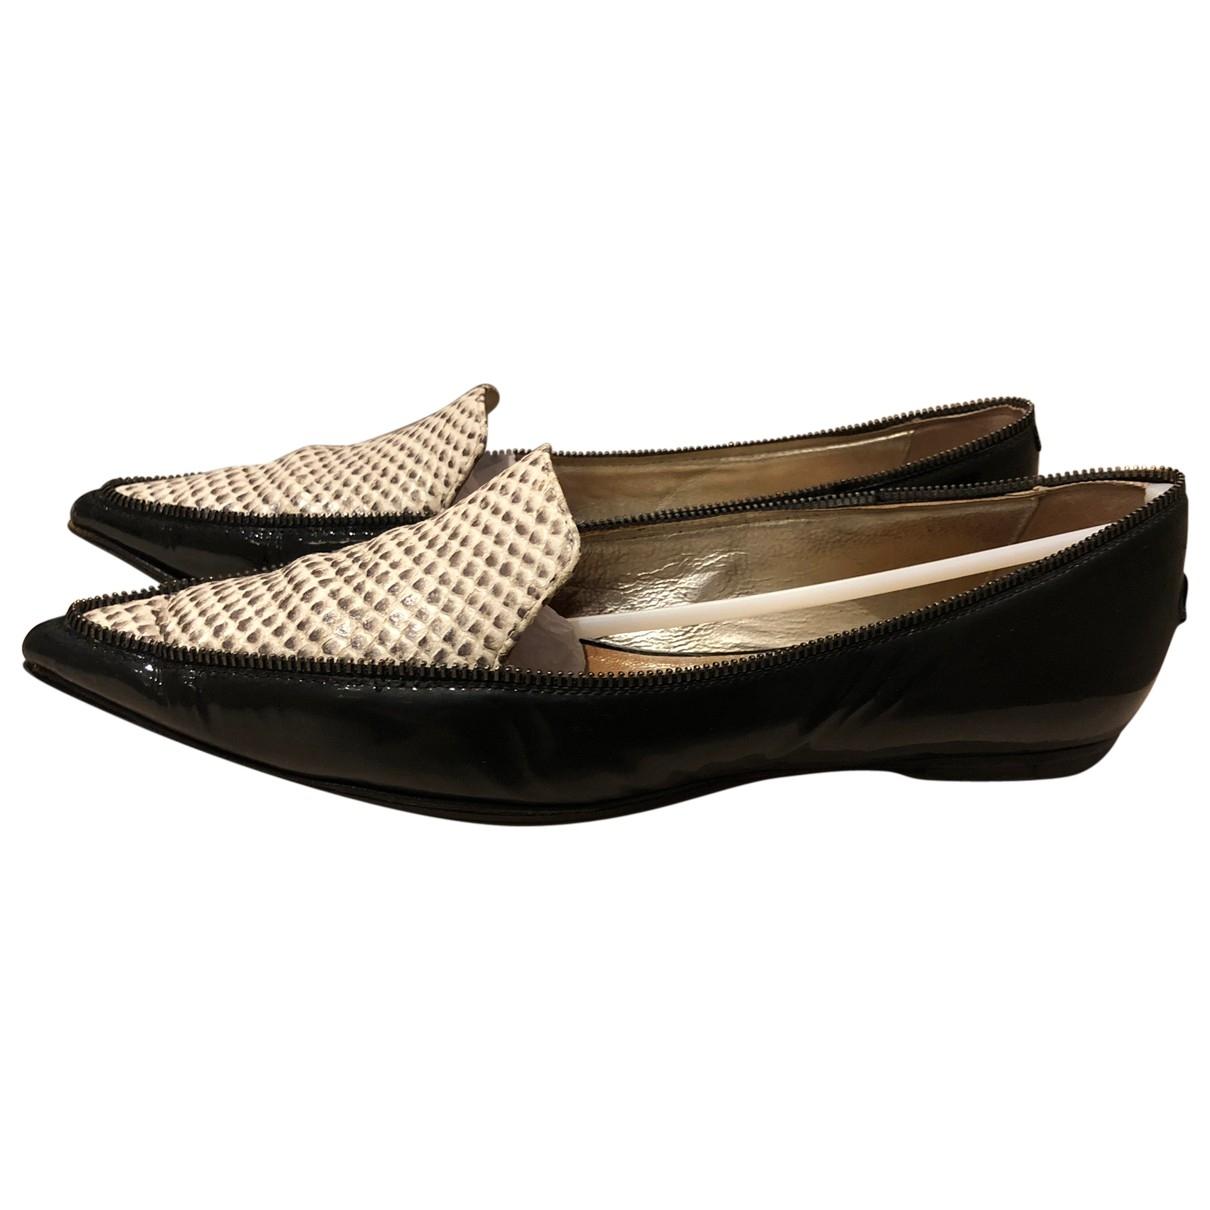 Jimmy Choo \N Black Patent leather Flats for Women 34.5 EU